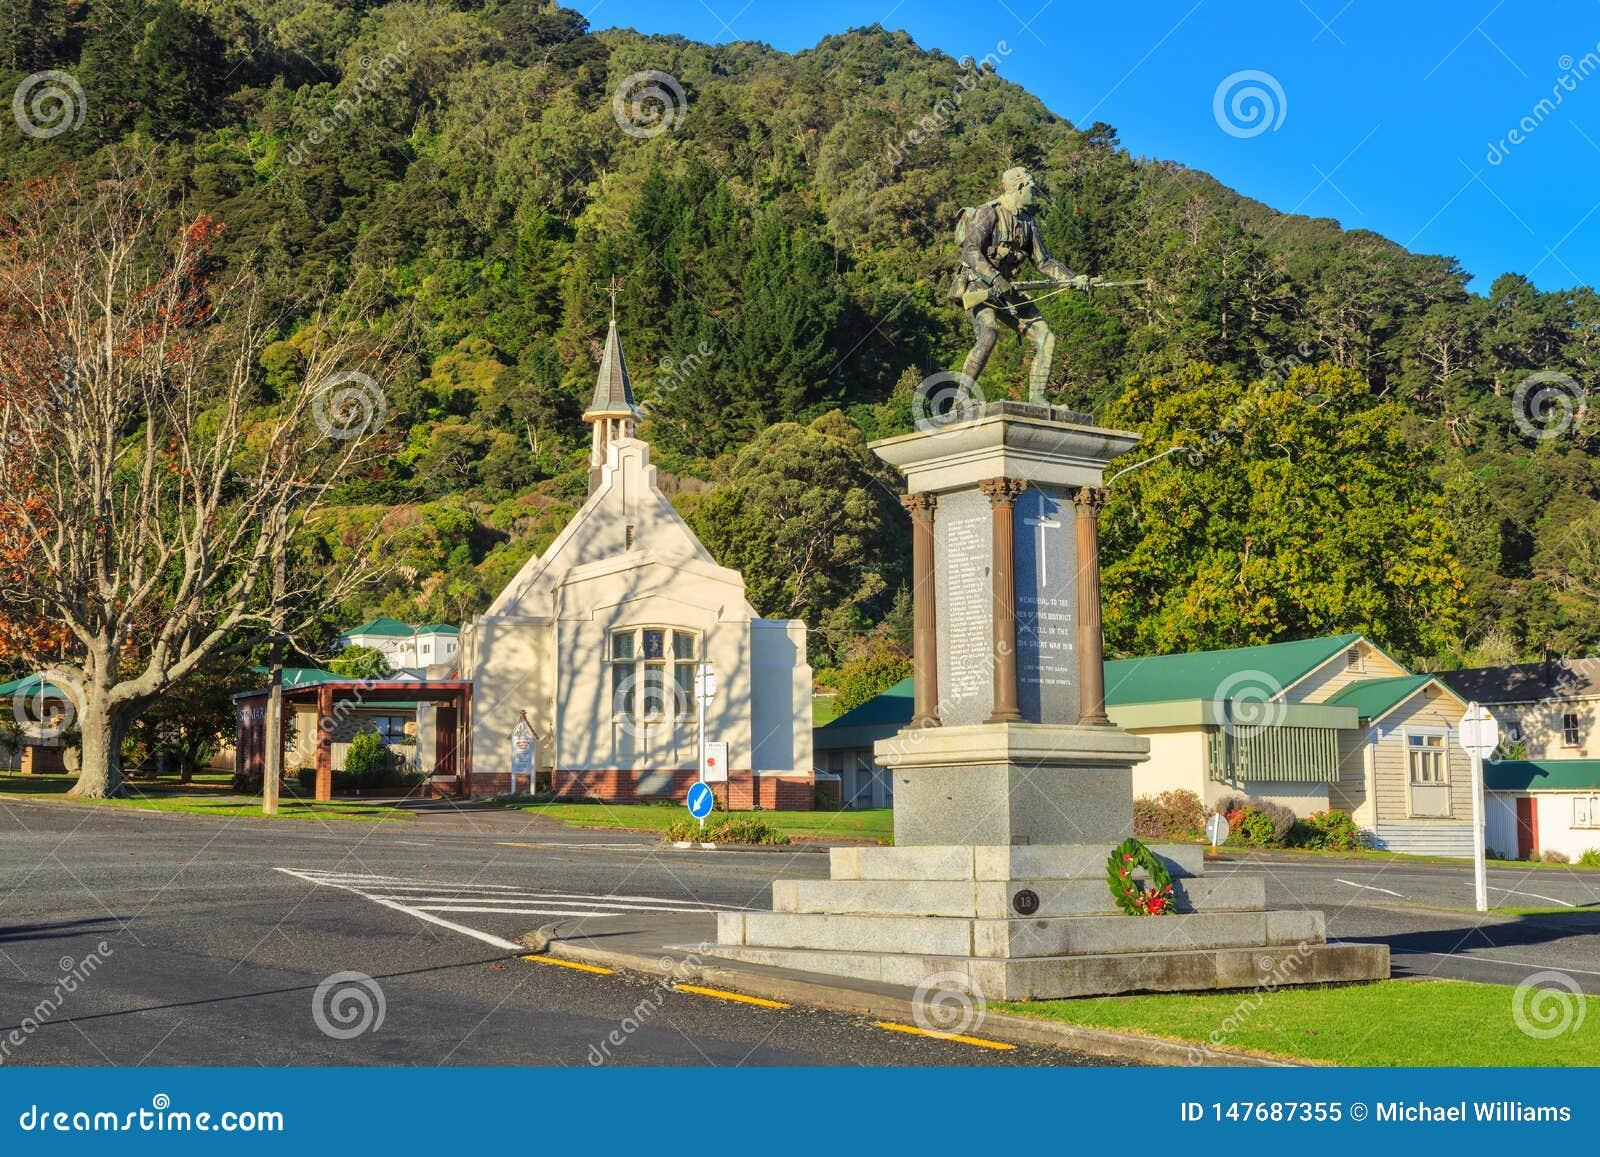 World War 1 memorial and old church, Te Aroha, New Zealand